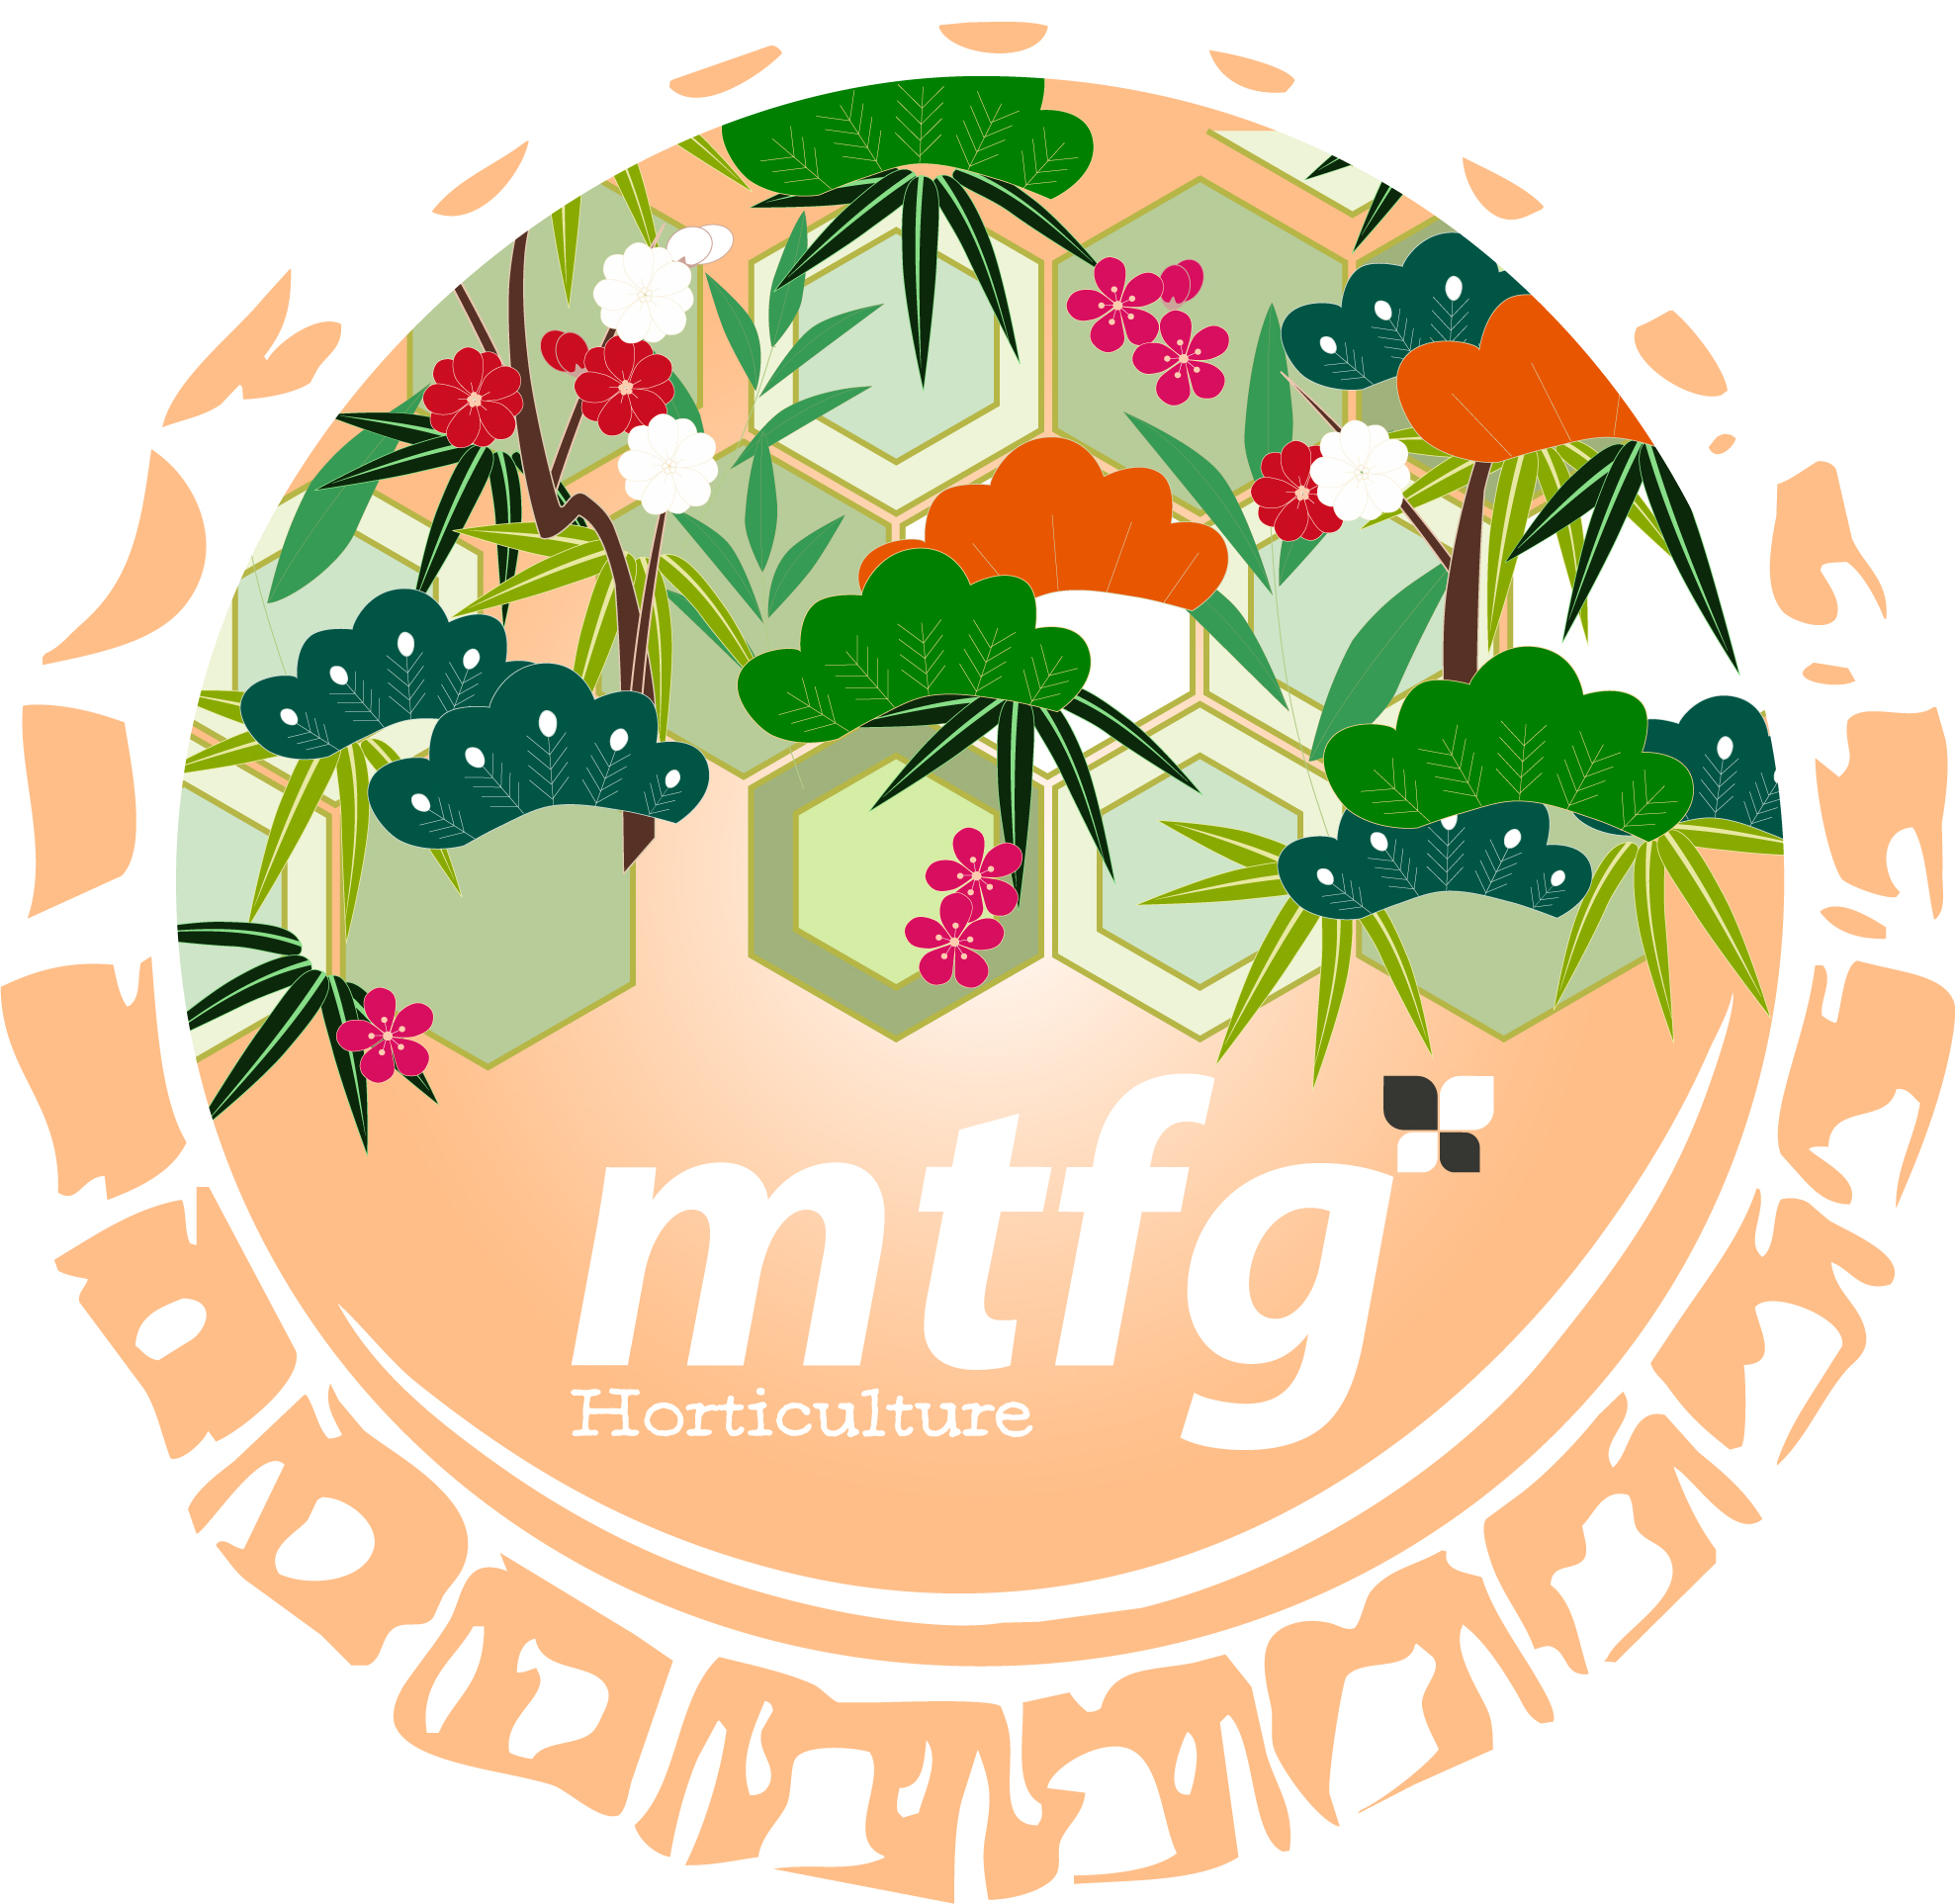 MTFG Horticulture